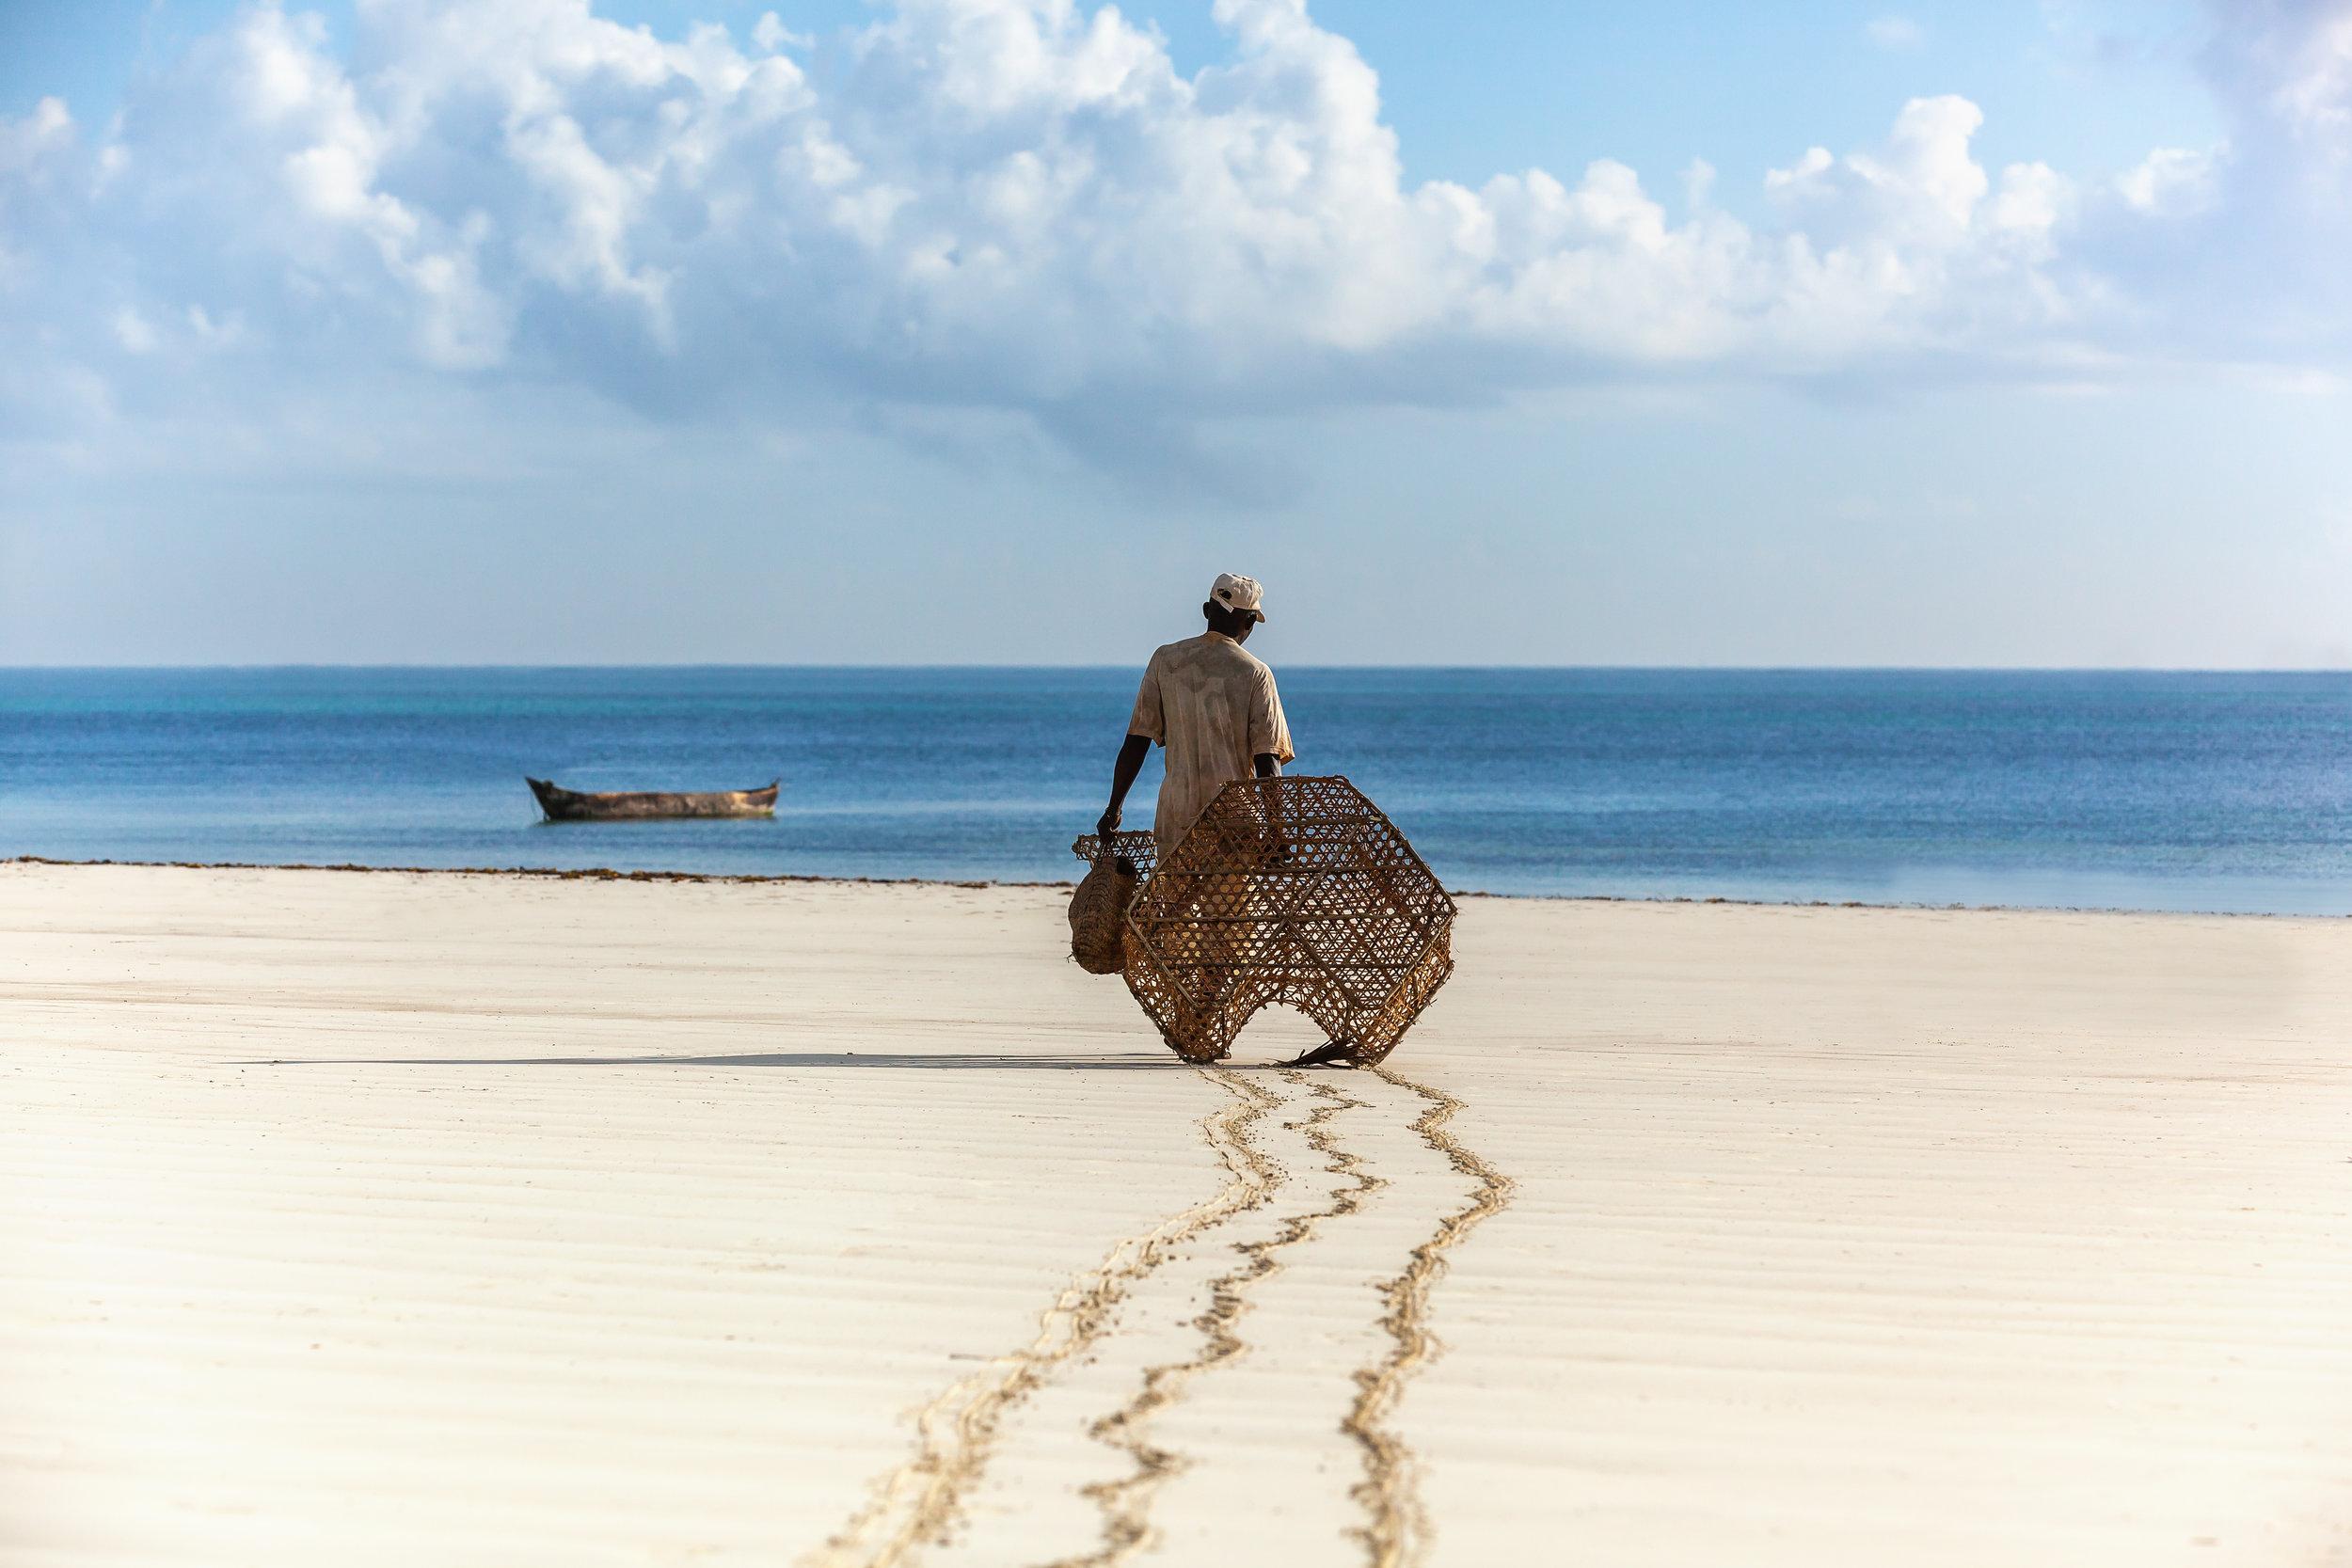 Fisherman in Kenya, water, nature, people, fishing, ocean